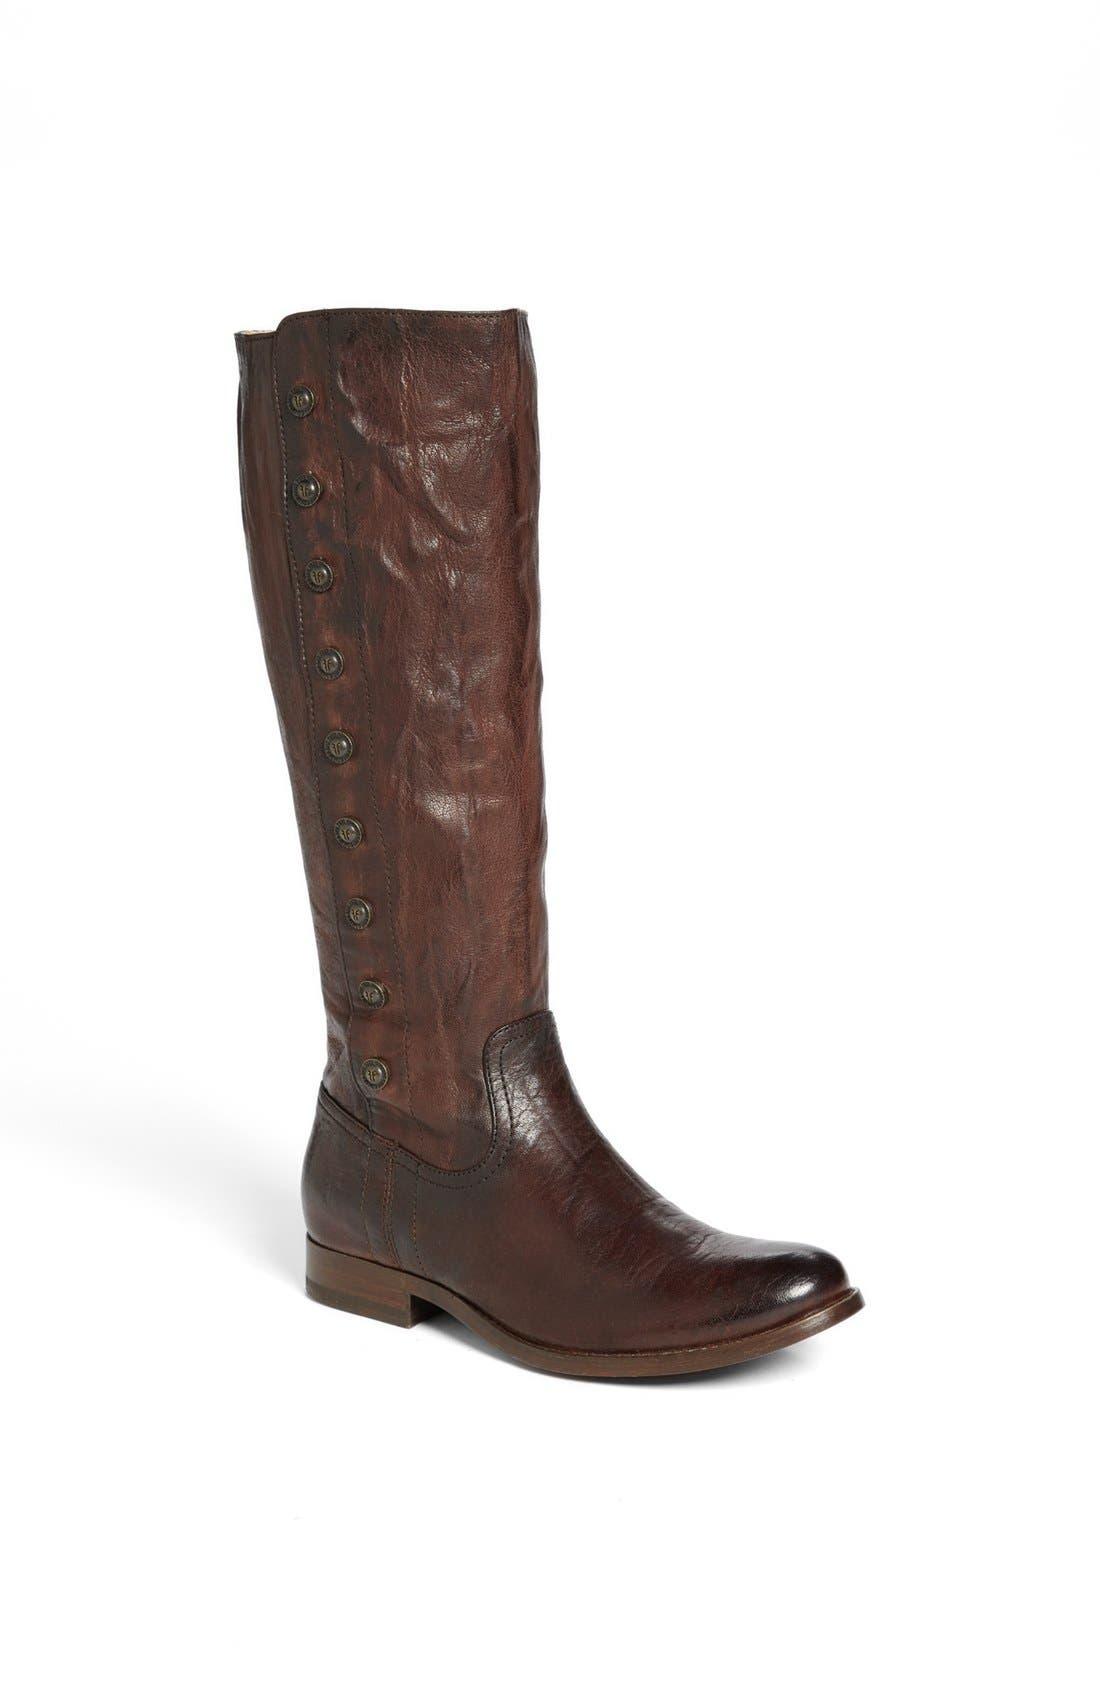 Main Image - Frye 'Melissa Military' Tall Boot